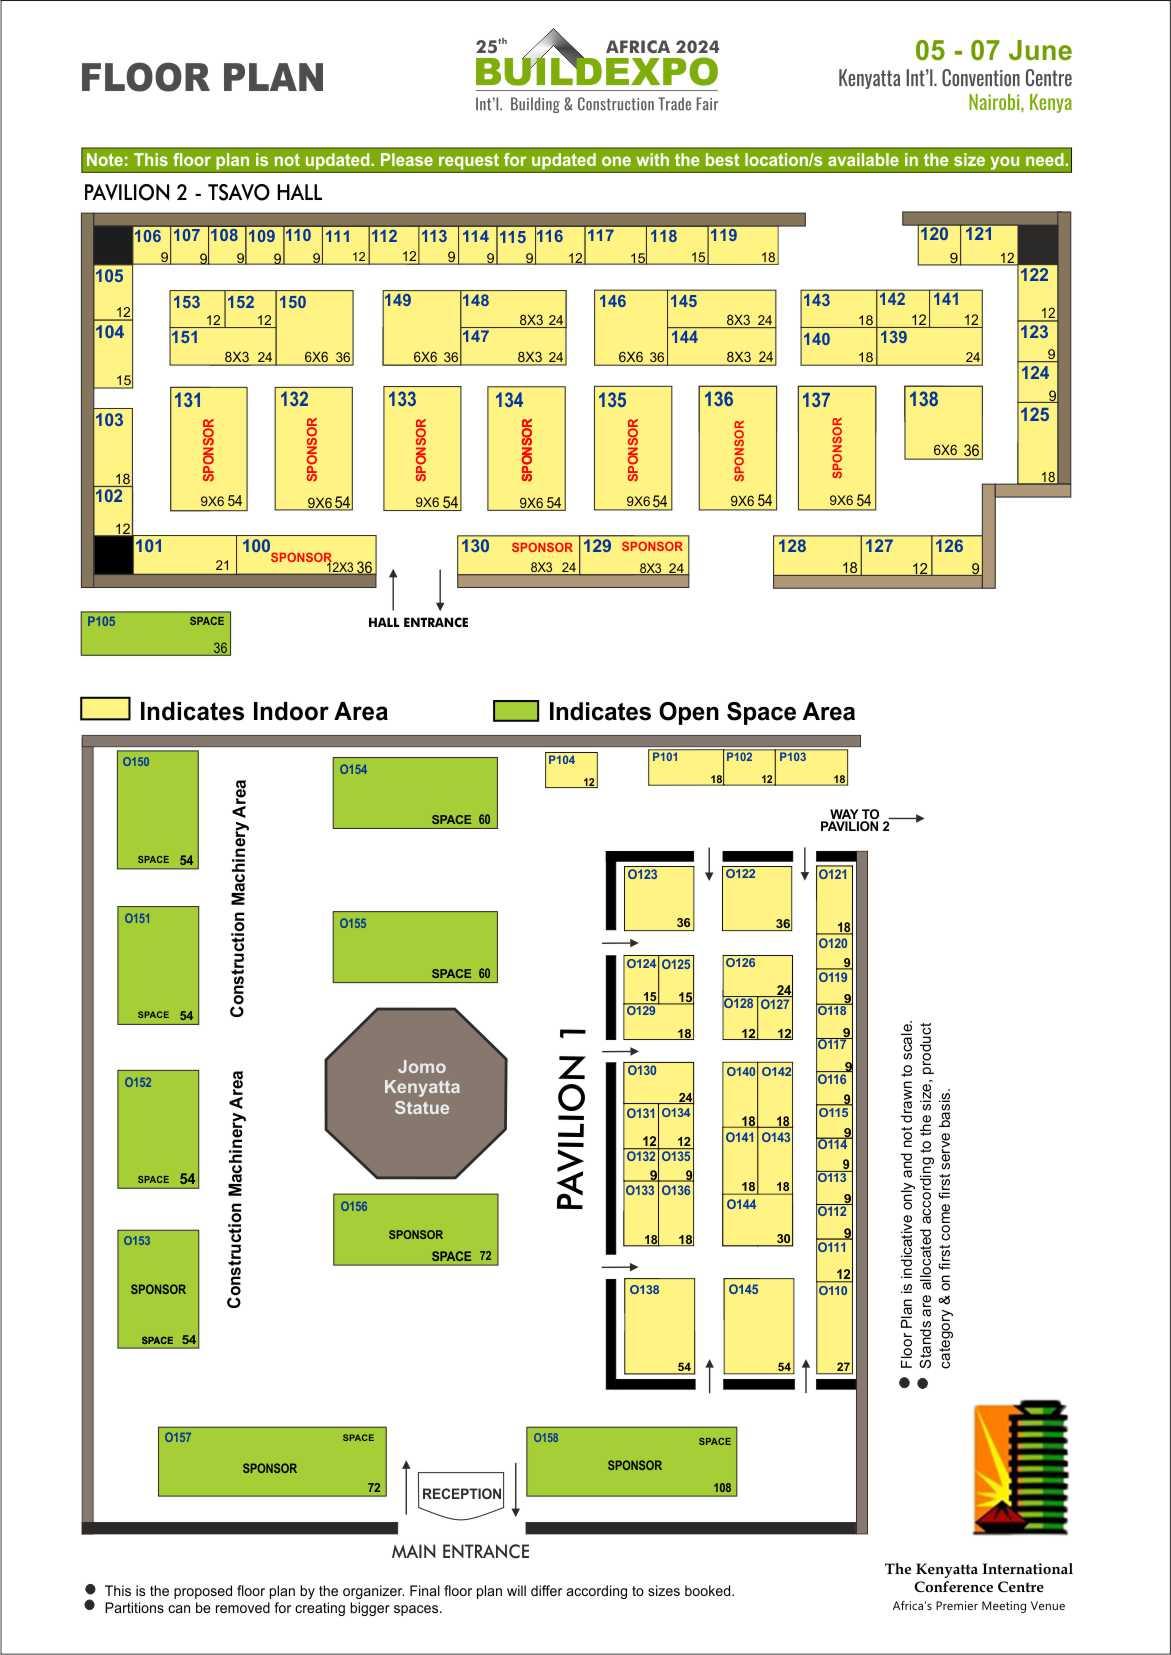 Floor plan for construction trade show buildexpo kenya 2019 for Trade show floor plan